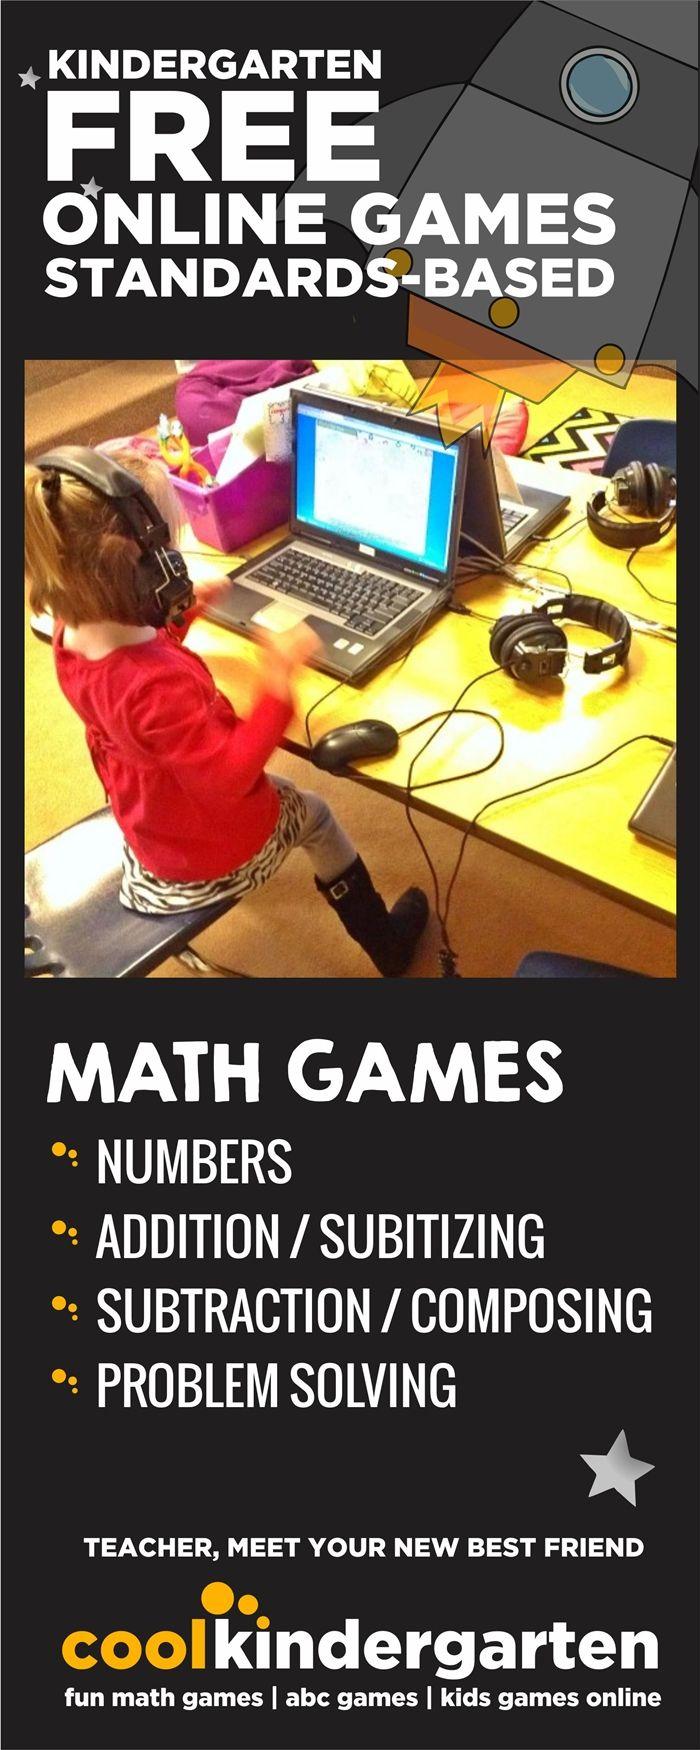 Cool Math Games For Kindergarten Free Online